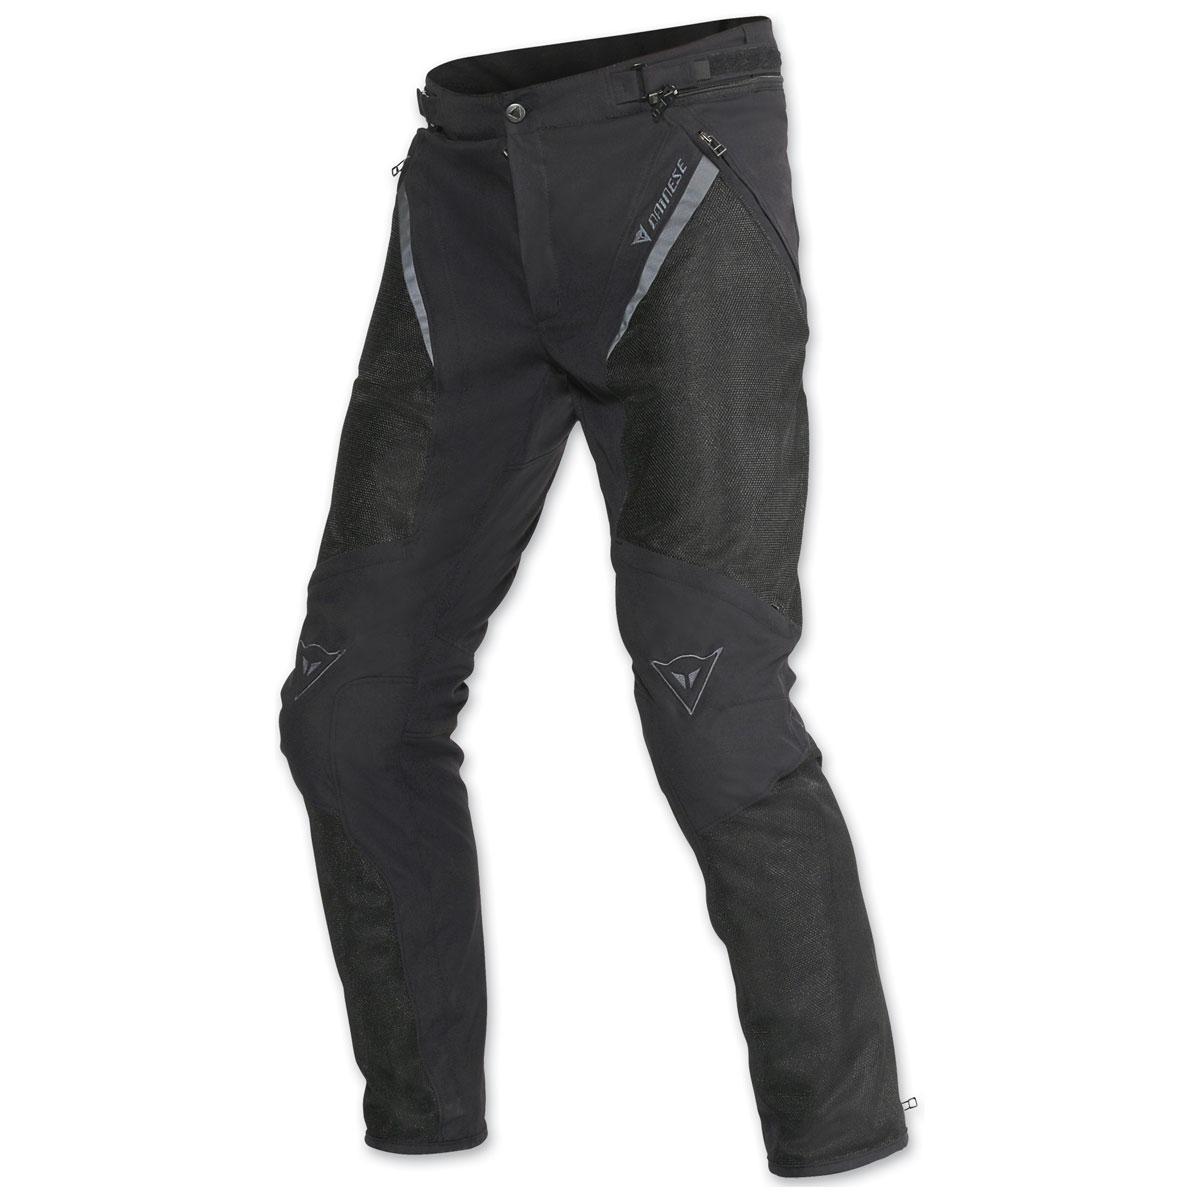 Dainese Men's Drake Super Air Black Textile Pants